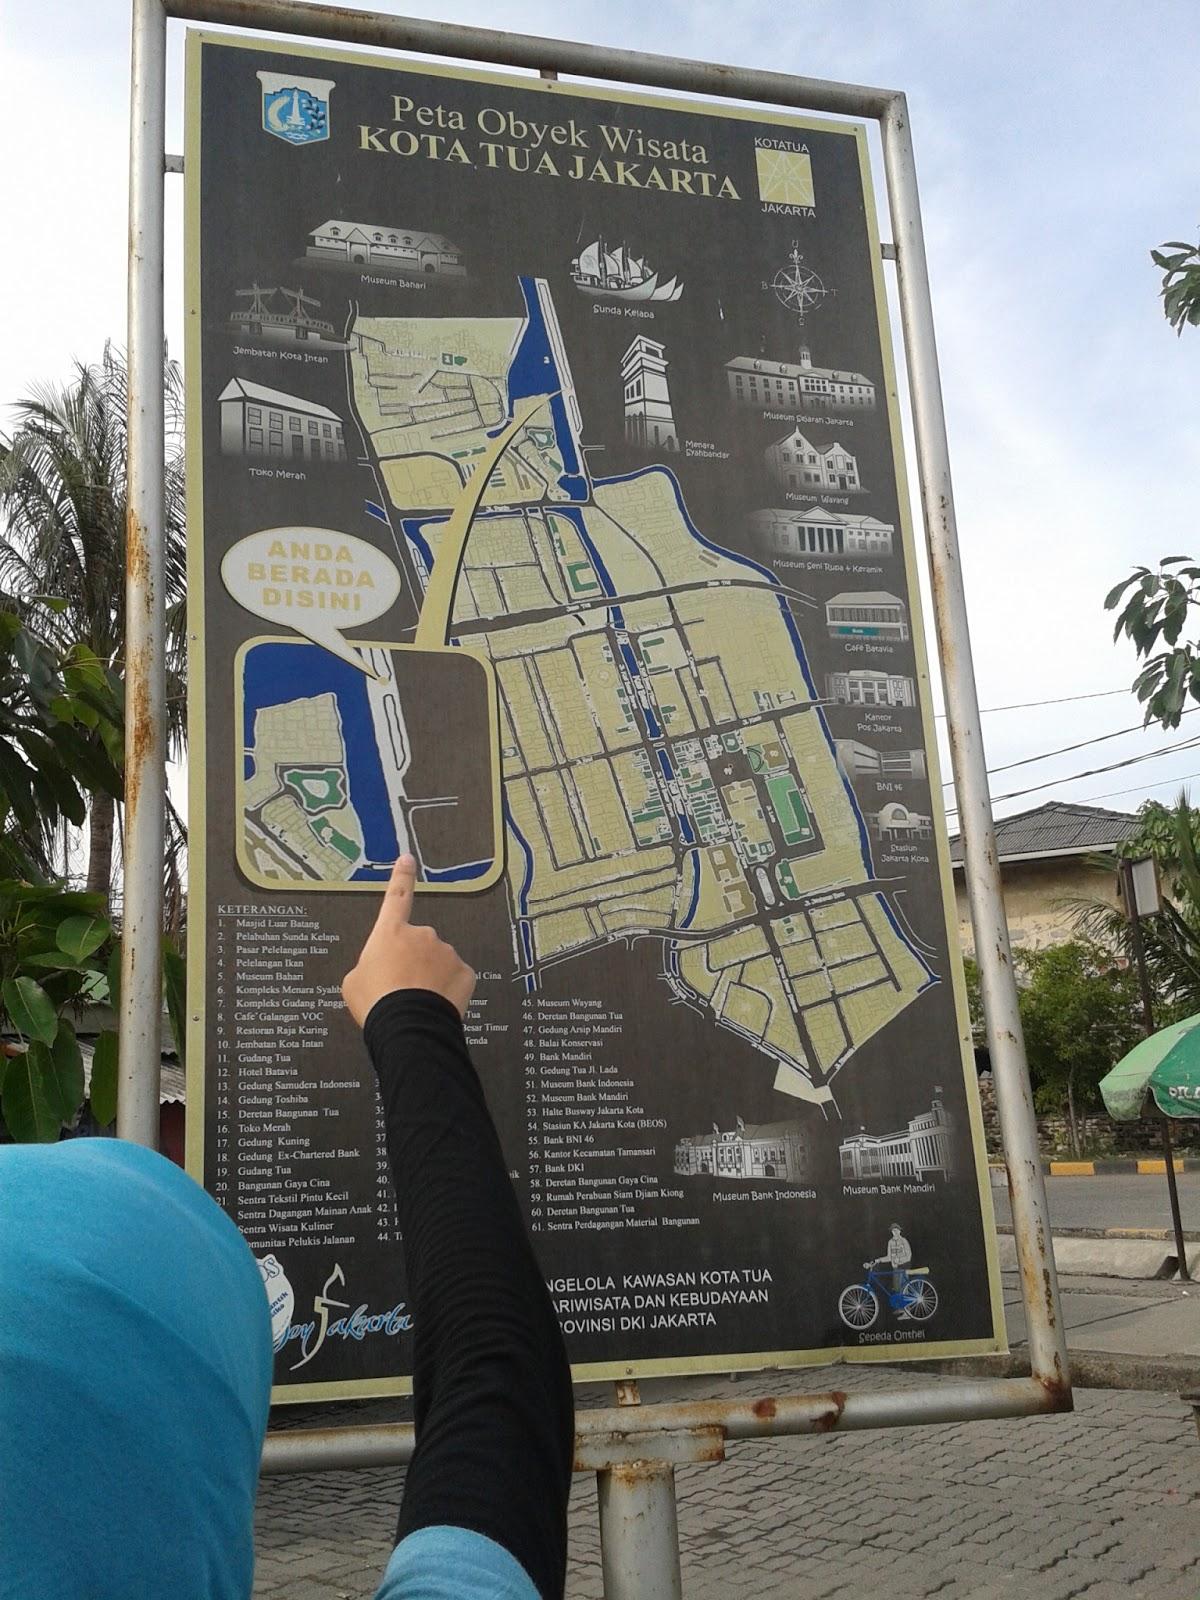 Sahabat Zieran: One day trip to Kota Tua Jakarta, The Last